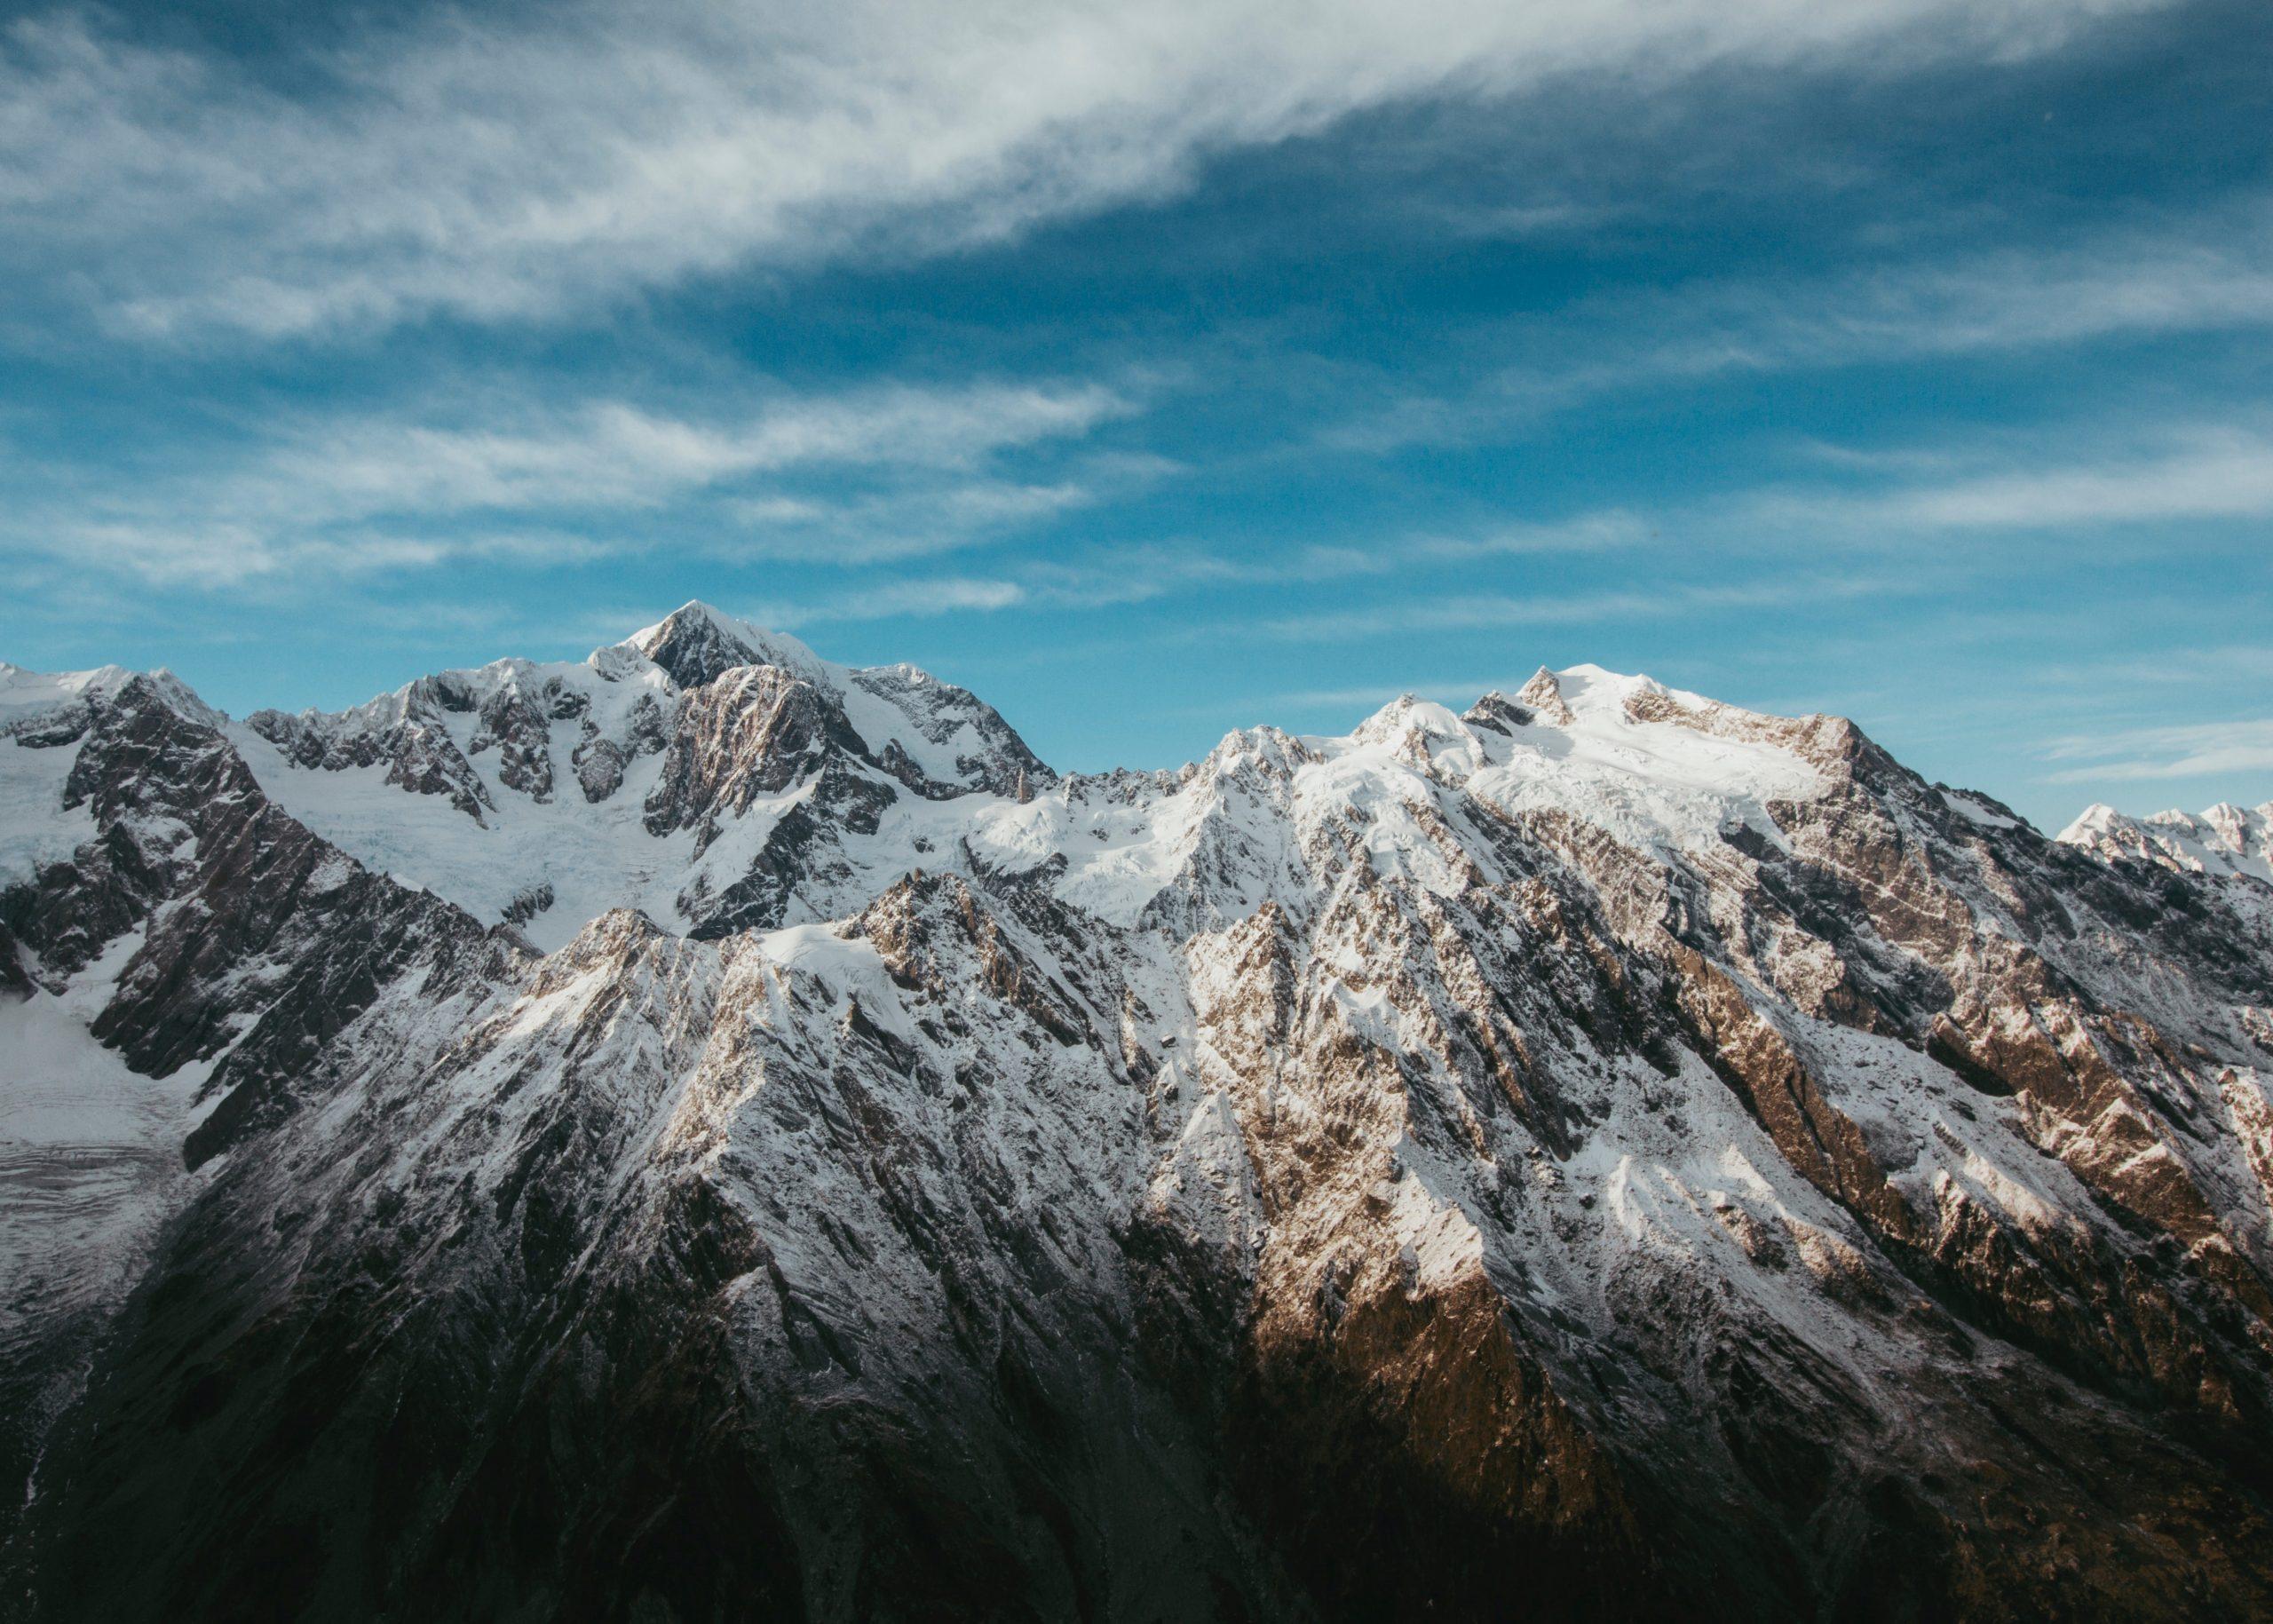 Marvelous Snowcapped Peaks